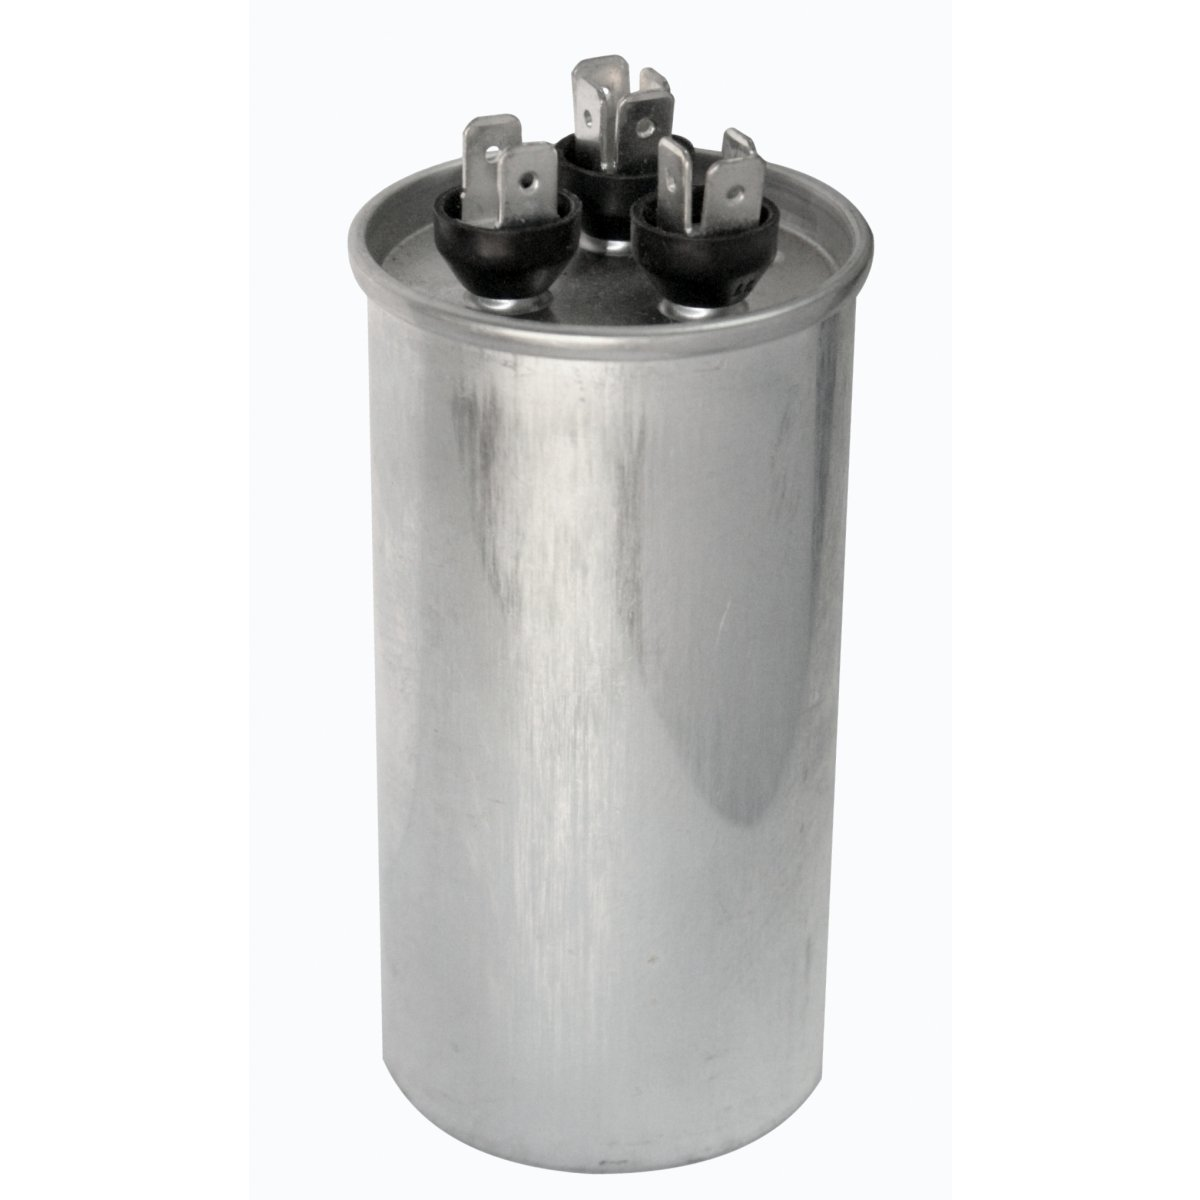 2-Pack, Lennox Y4609, FirstChoice 4JR0535-II-EW Dual Run Capacitor, Round, 440V, 5+35 MFD